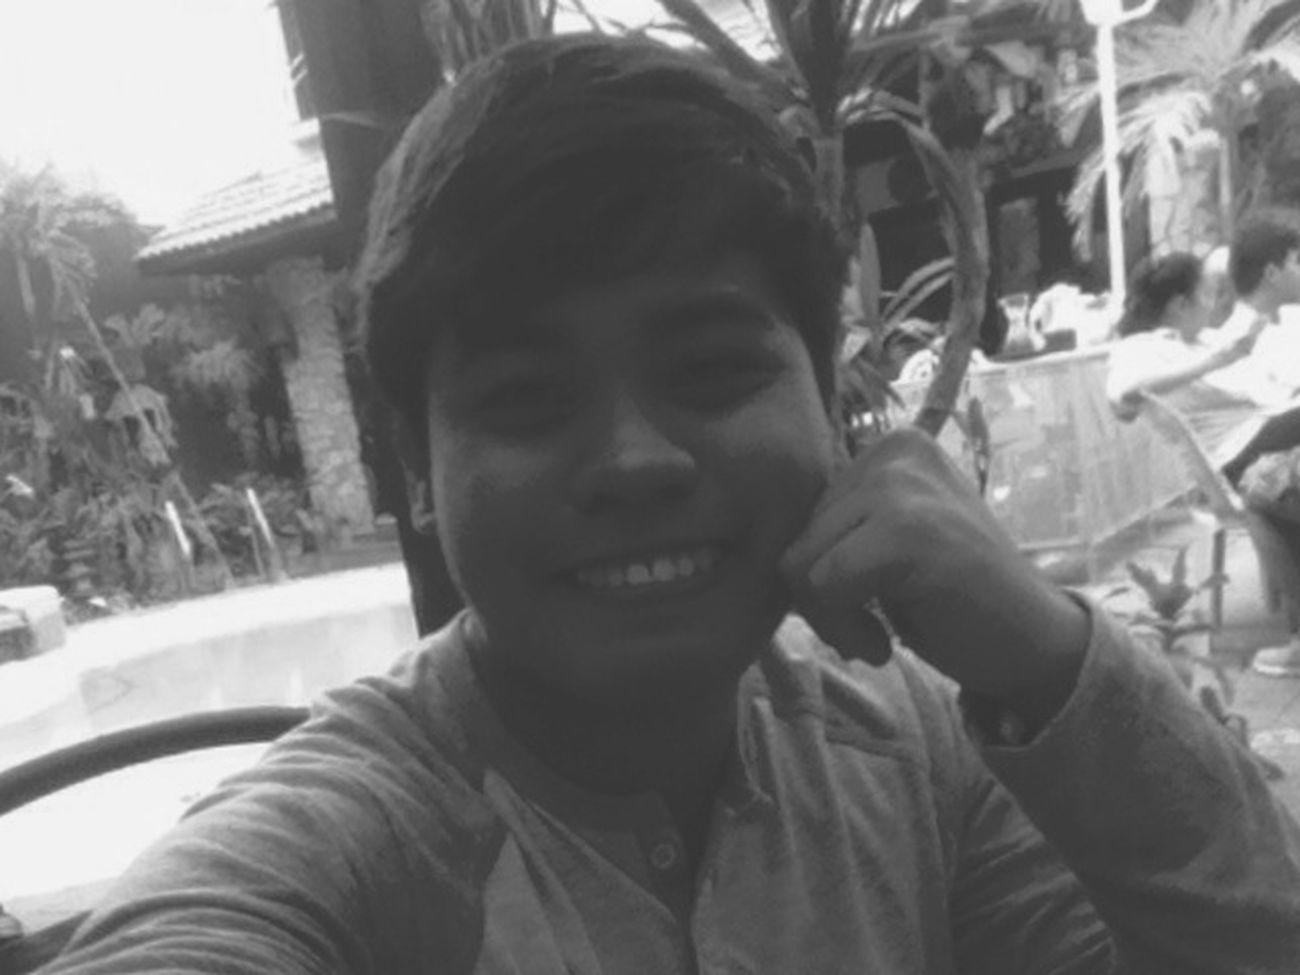 Gotta show that smile